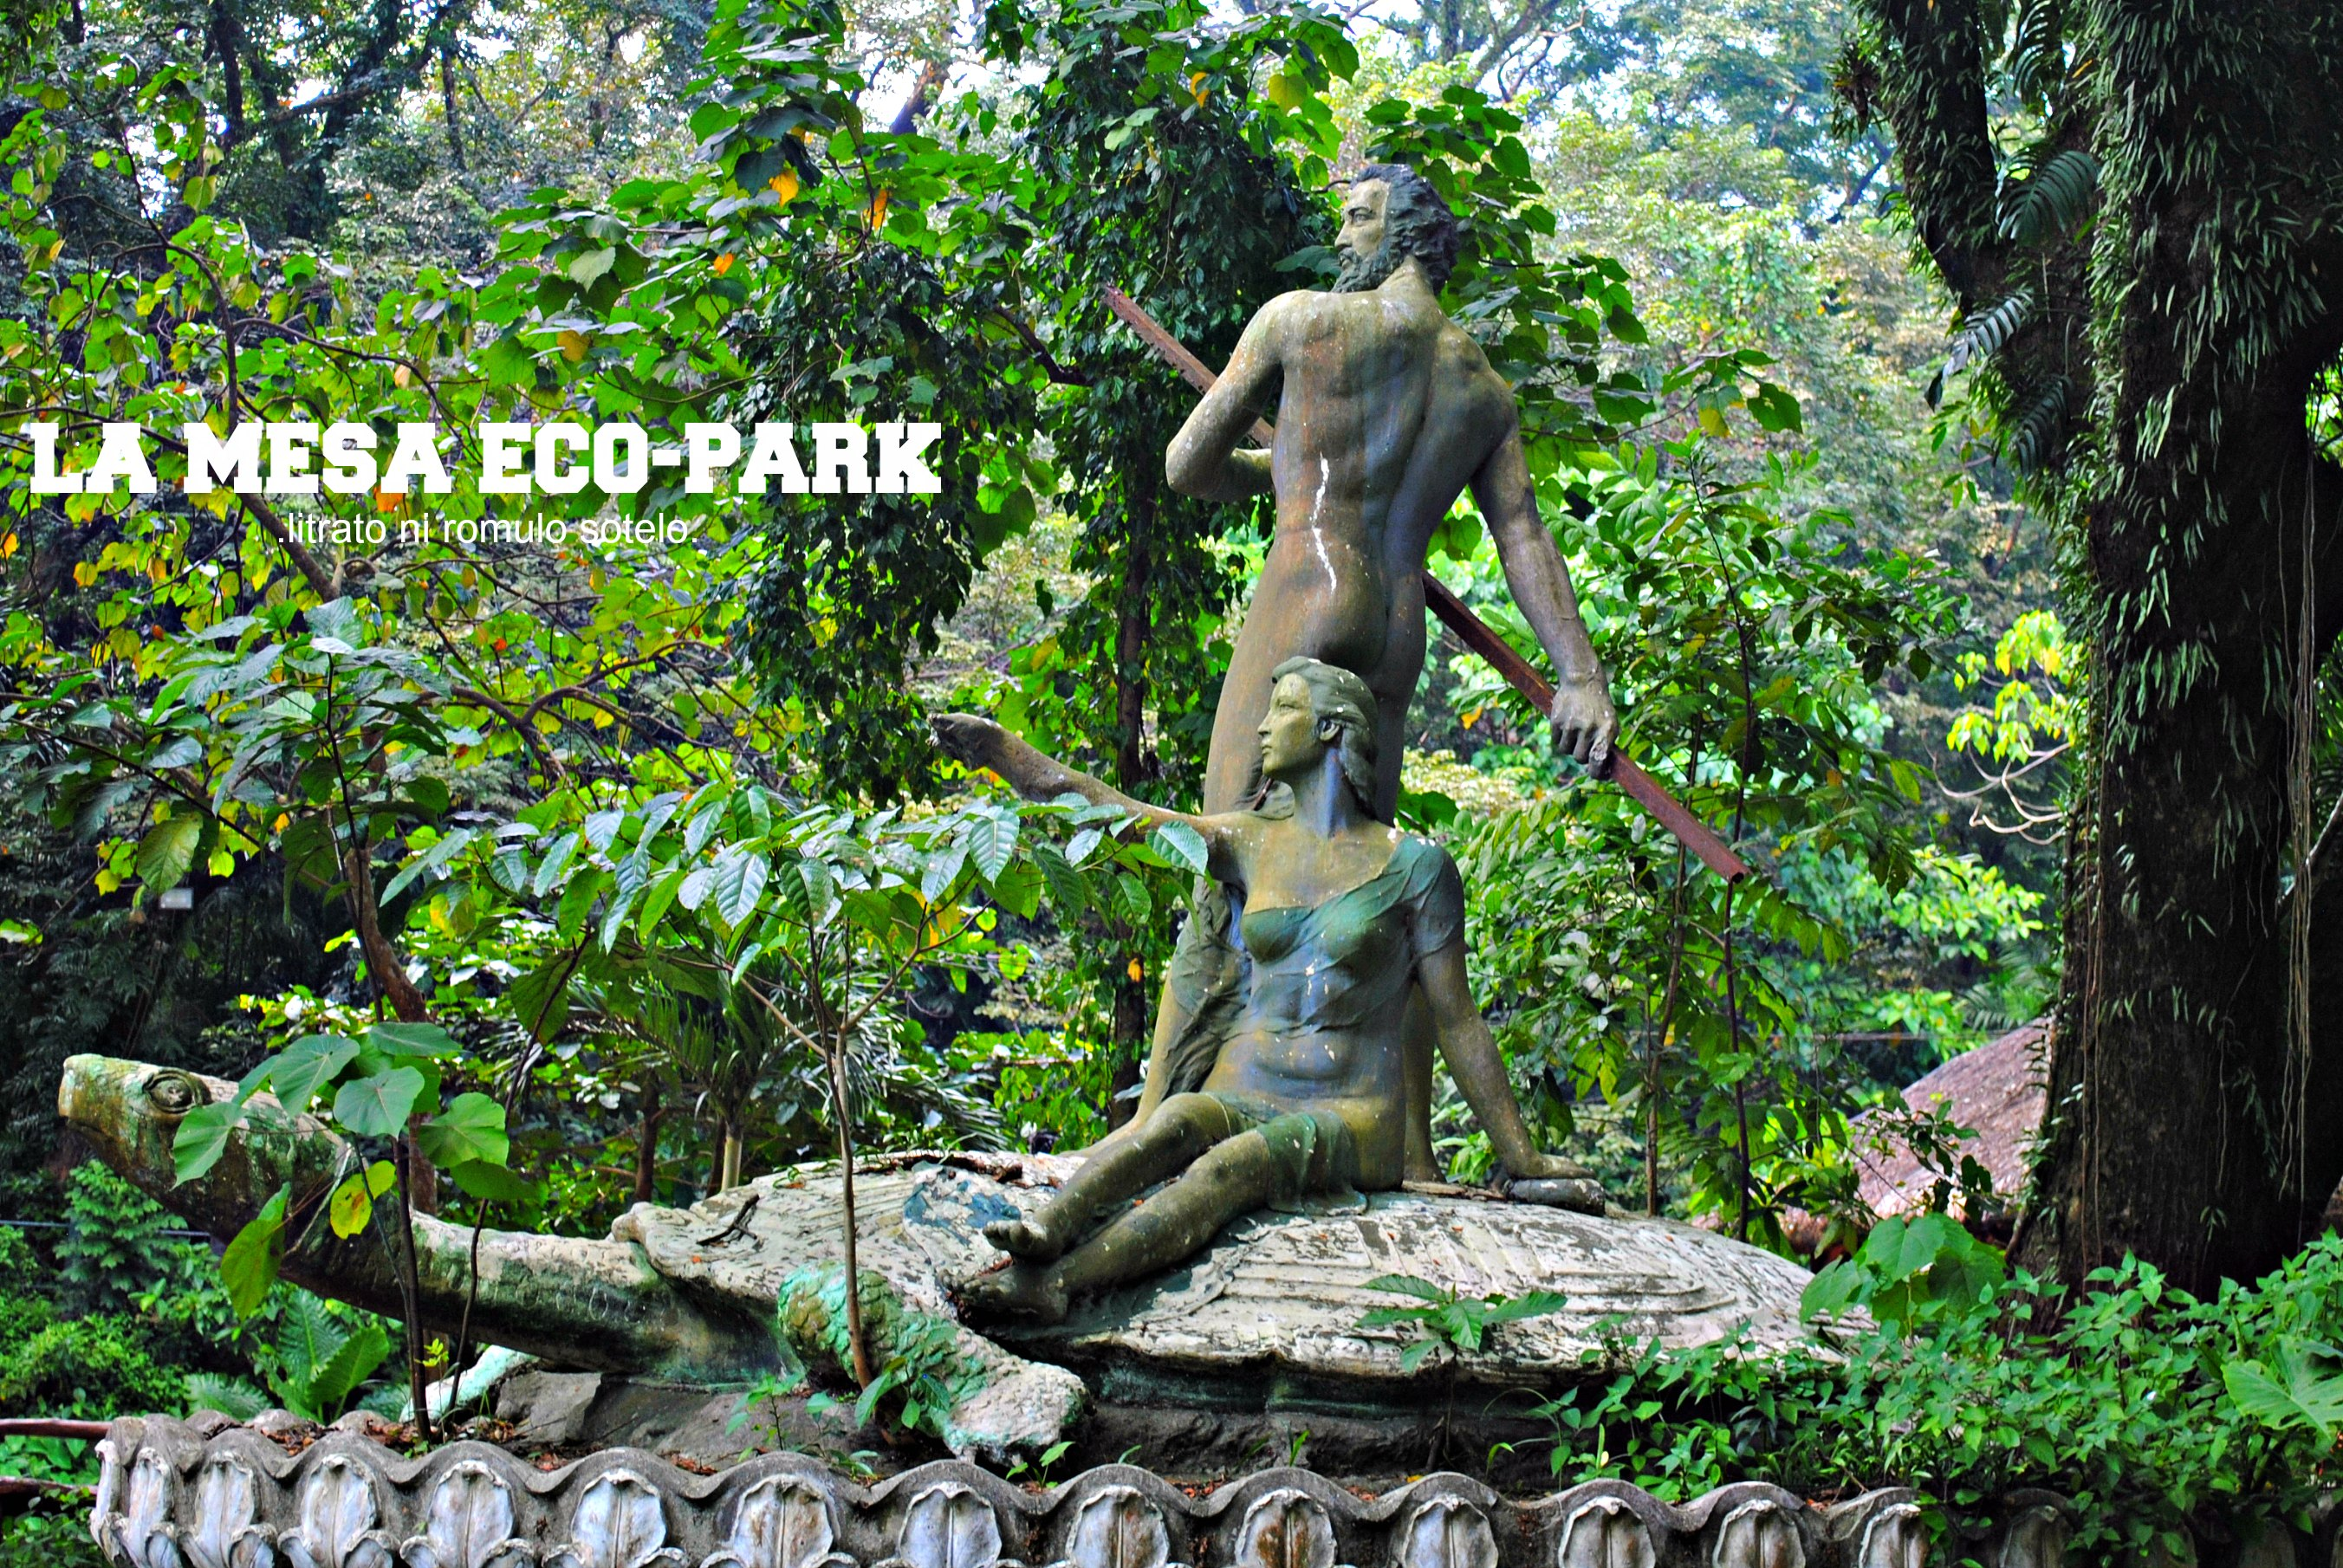 la mesa eco park La mesa eco park is located at quezon city entrance fee: php 50 swimming pool : php 80 #lamesaecopark.